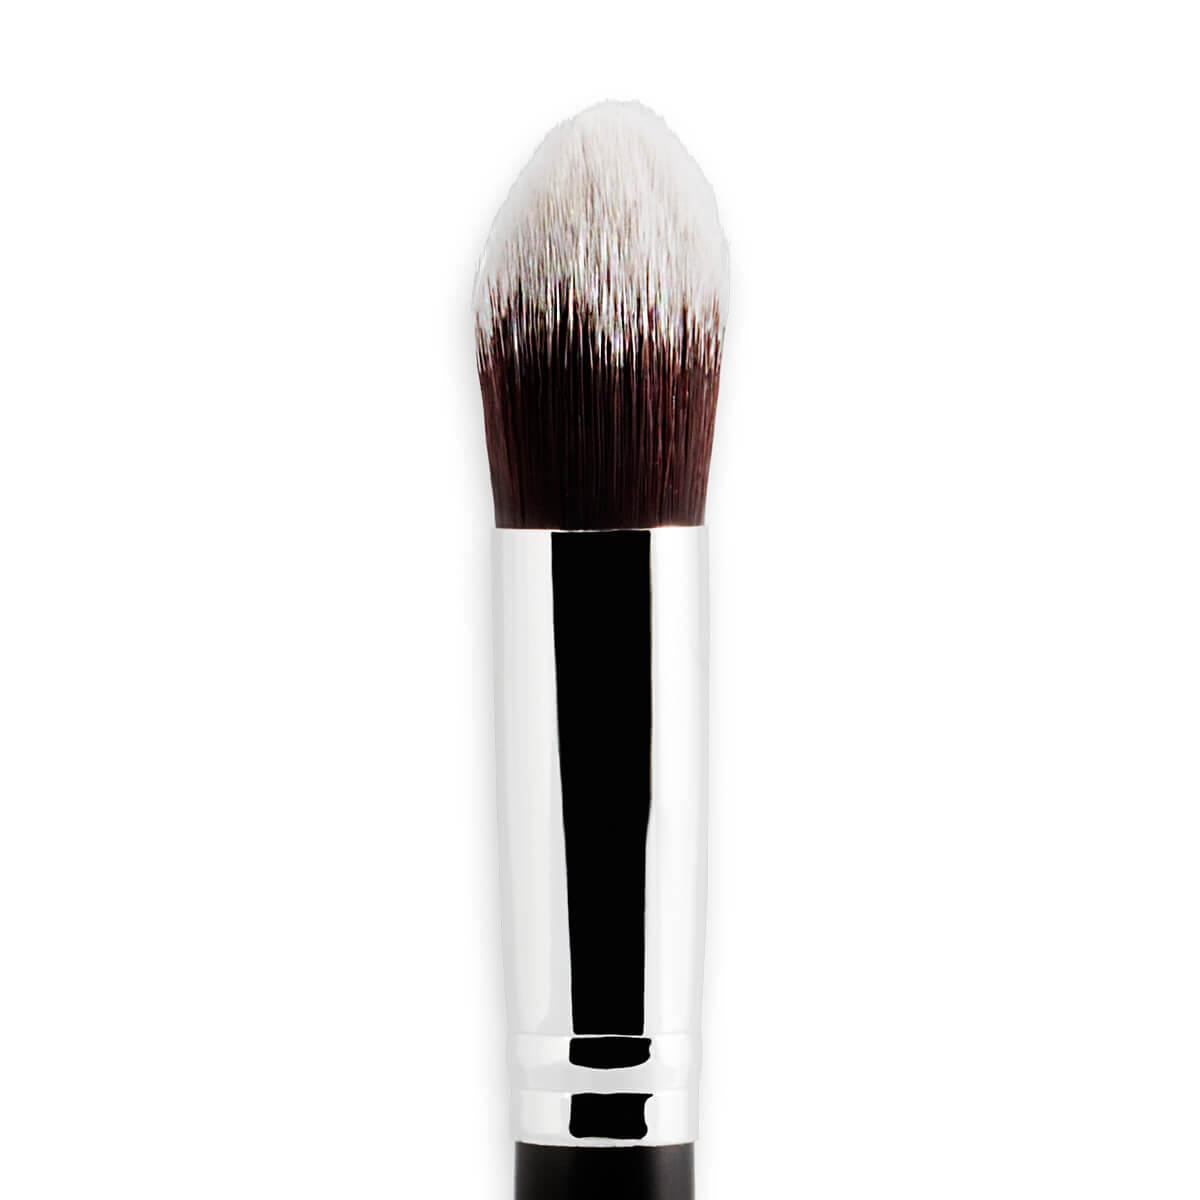 S113 - Pincel Kabuki Cônico Profissional Sffumato Beauty